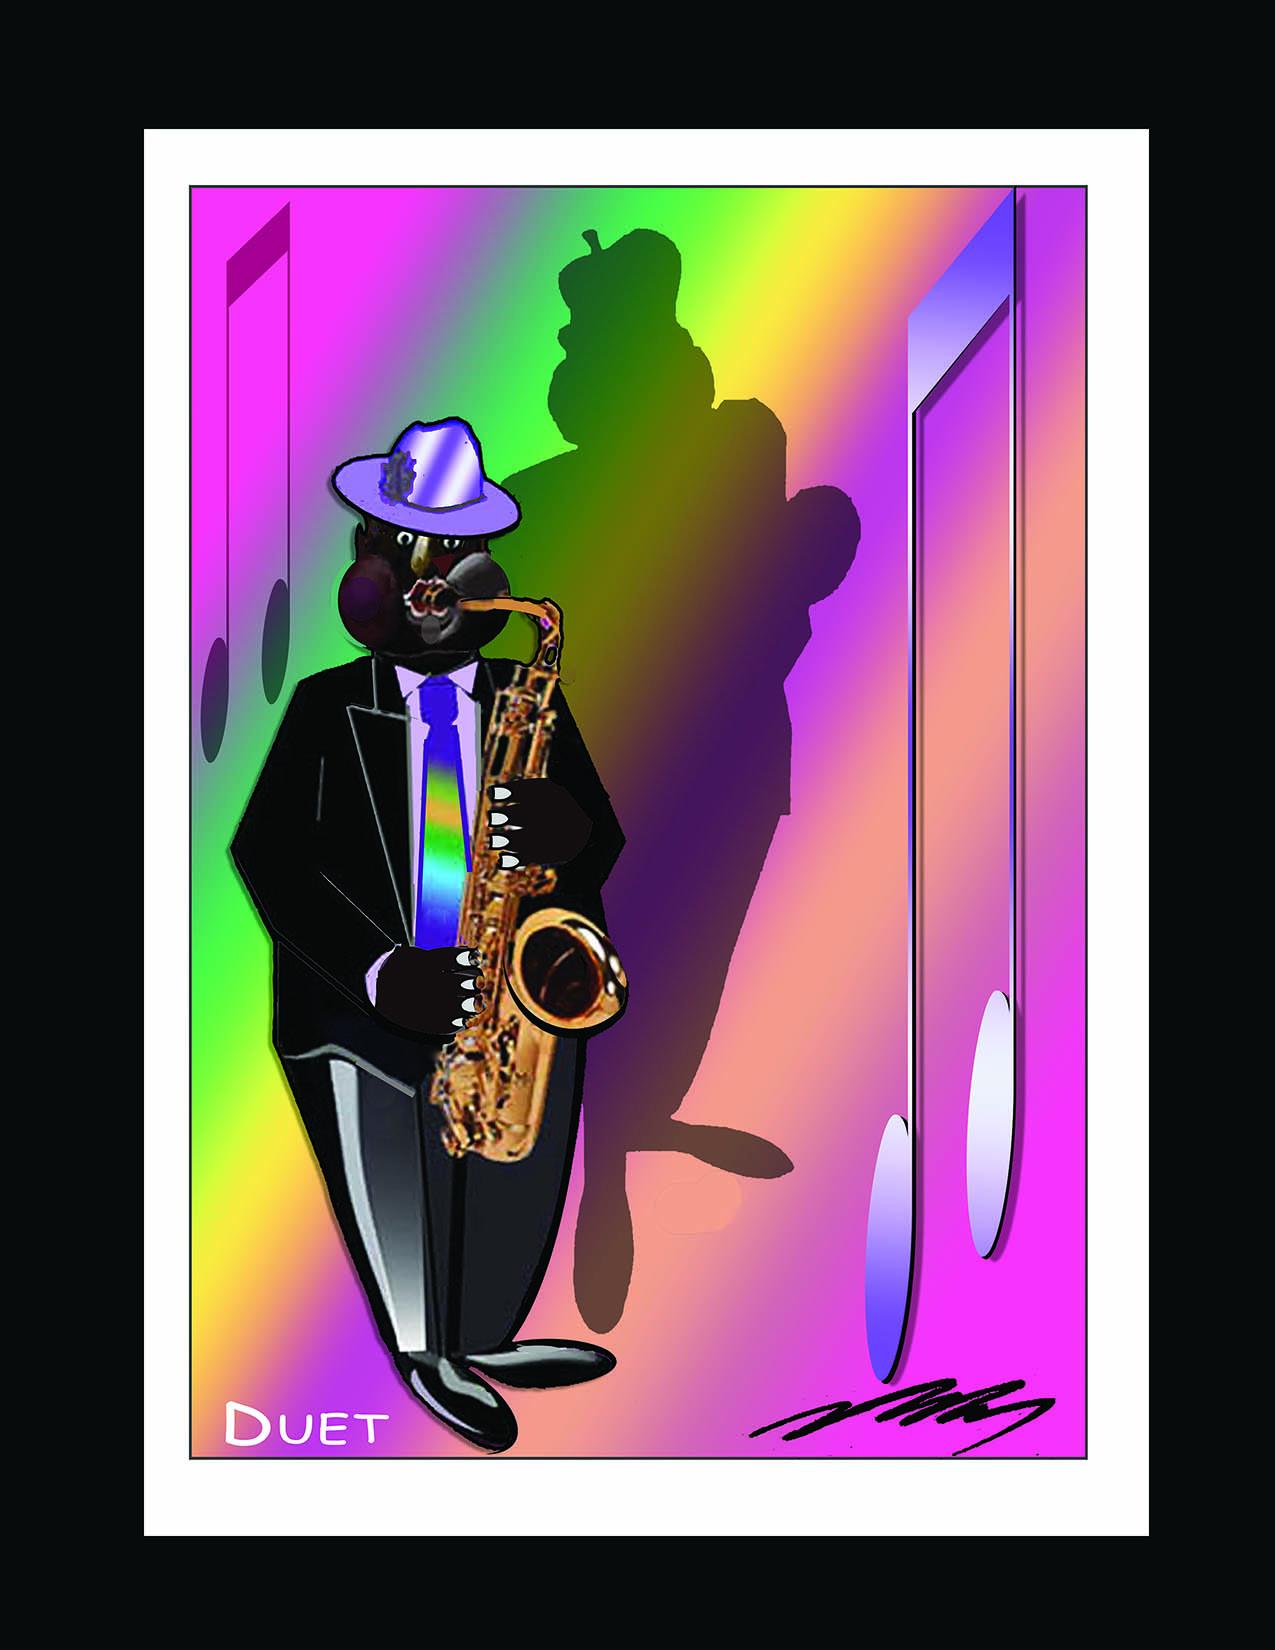 New Saxophone Silhouette